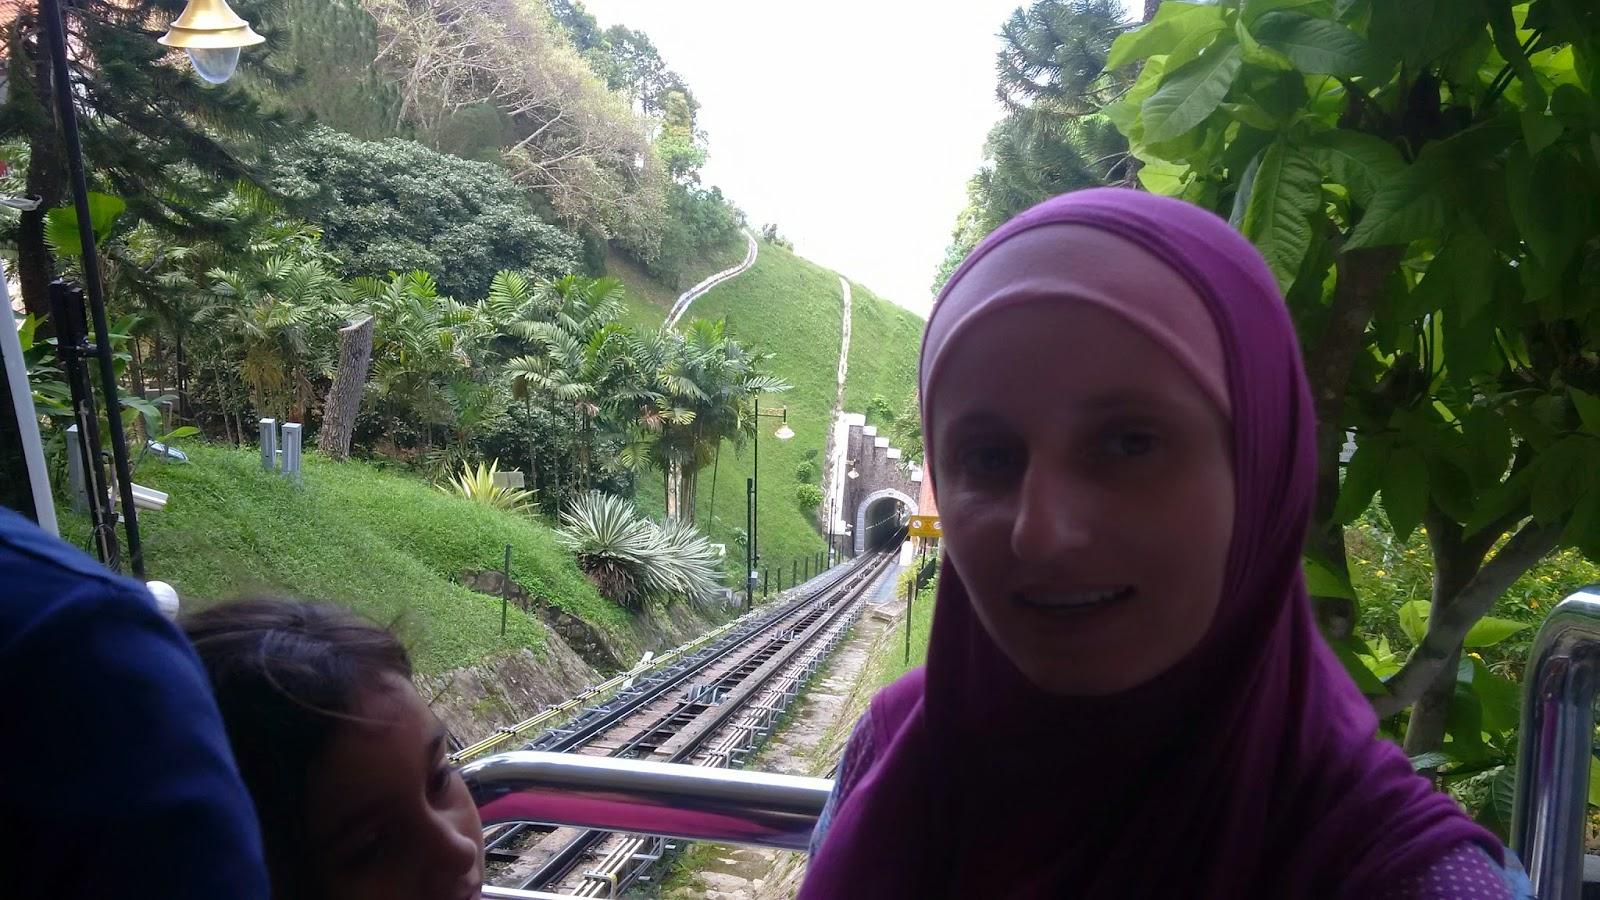 """malaysia travel influencer,  malaysia influencer,  blog with cris,  malaysia blogger,  malaysia freelance model,  penang georgetown,  penang tourism,  penang island,  penang beaches,  penang chinese,  penang food,  penang hill,  penang hotel,  penang destinations,  penang georgetown,  penang beaches,  penang food,  penang malaysia weather,  penang flag,  penang chinese,  best view in penang,  what to do in penang in 3 days,  things to do in penang with kids,  penang things to do,  penang tourism,  penang restaurant,  is georgetown penang safe,  getting to georgetown malaysia,  klook penang office,  kkday penang,  klook terengganu,  klook penang hill,  klook sabah,  pocket wifi in penang airport,  penang tourism place,  penang tourism statistics 2019,  penang tourism office,  culture of penang,  penang unesco heritage zone,  penang heritage map,  penang malaysia things to do,  33 things to do in penang,  what to eat in penang, """